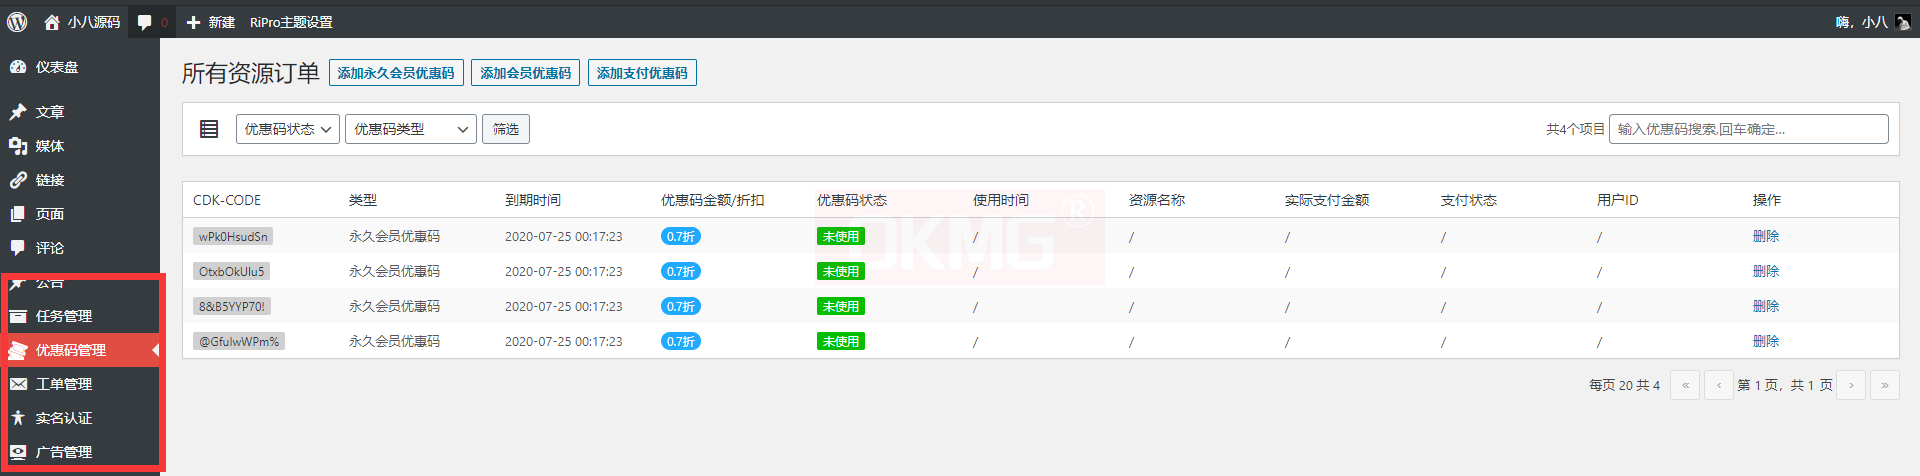 【RiPro主题 / RiPro美化 / 小八子主题】包更新